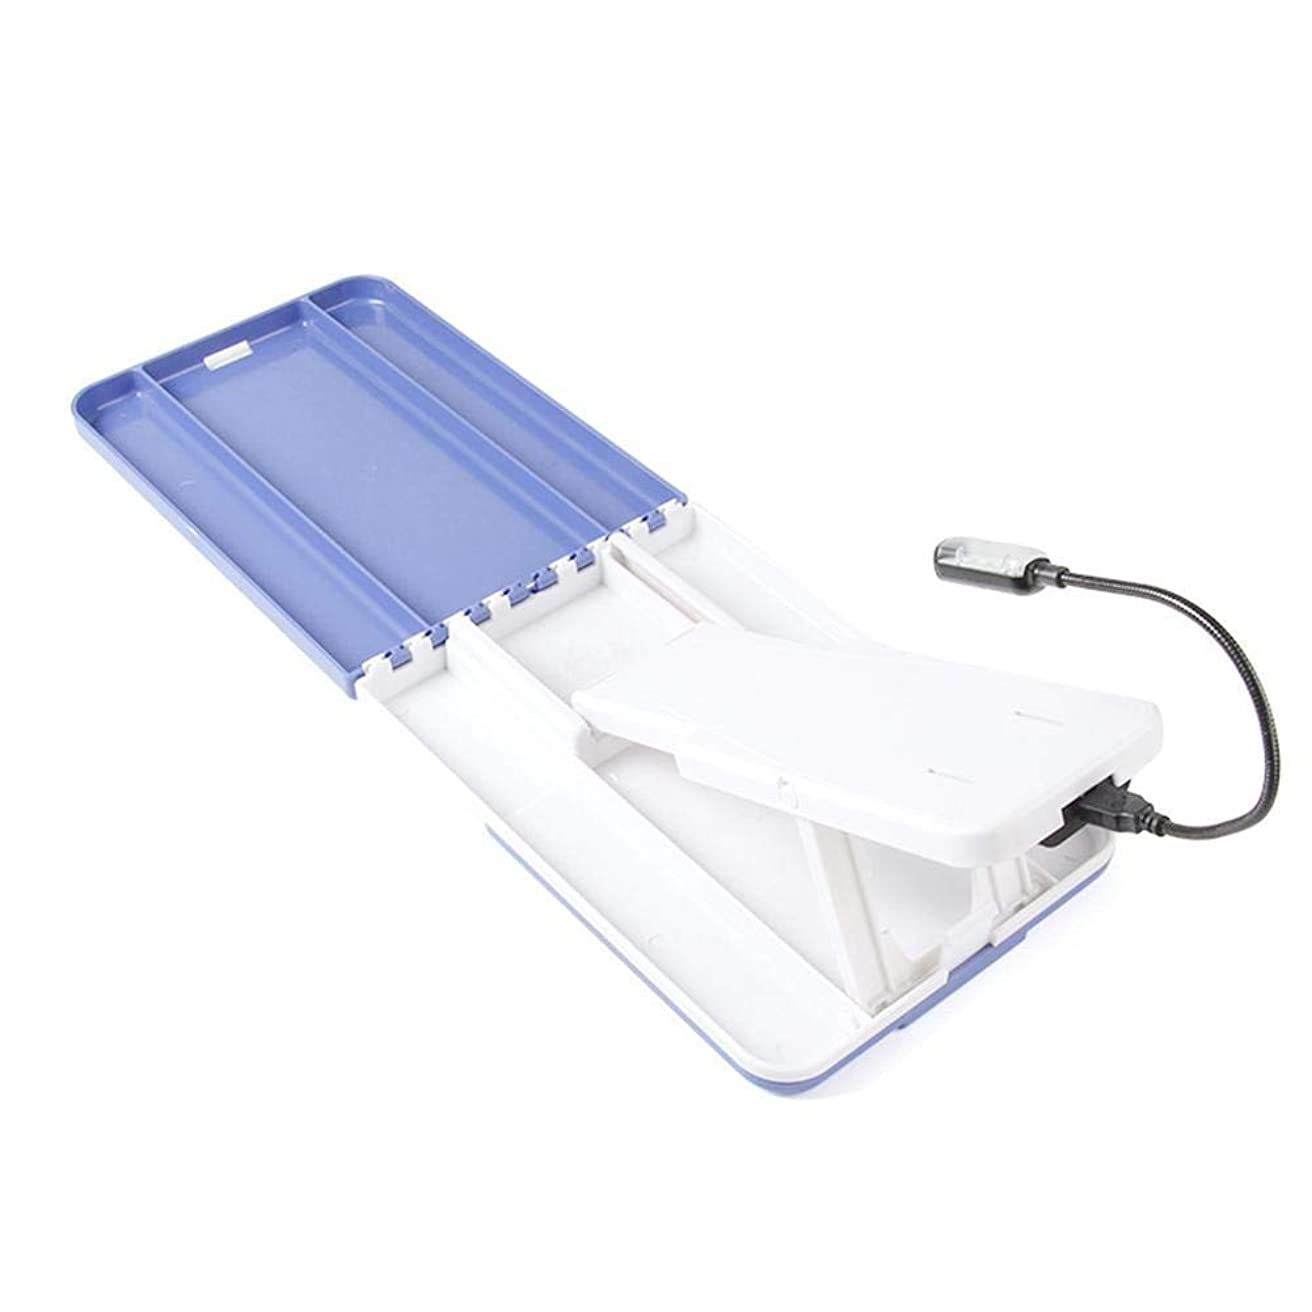 BETTER YOU (ベター ュー) トリムネイルツールボード、持ち運びが簡単、持ち運び、バッテリー付属